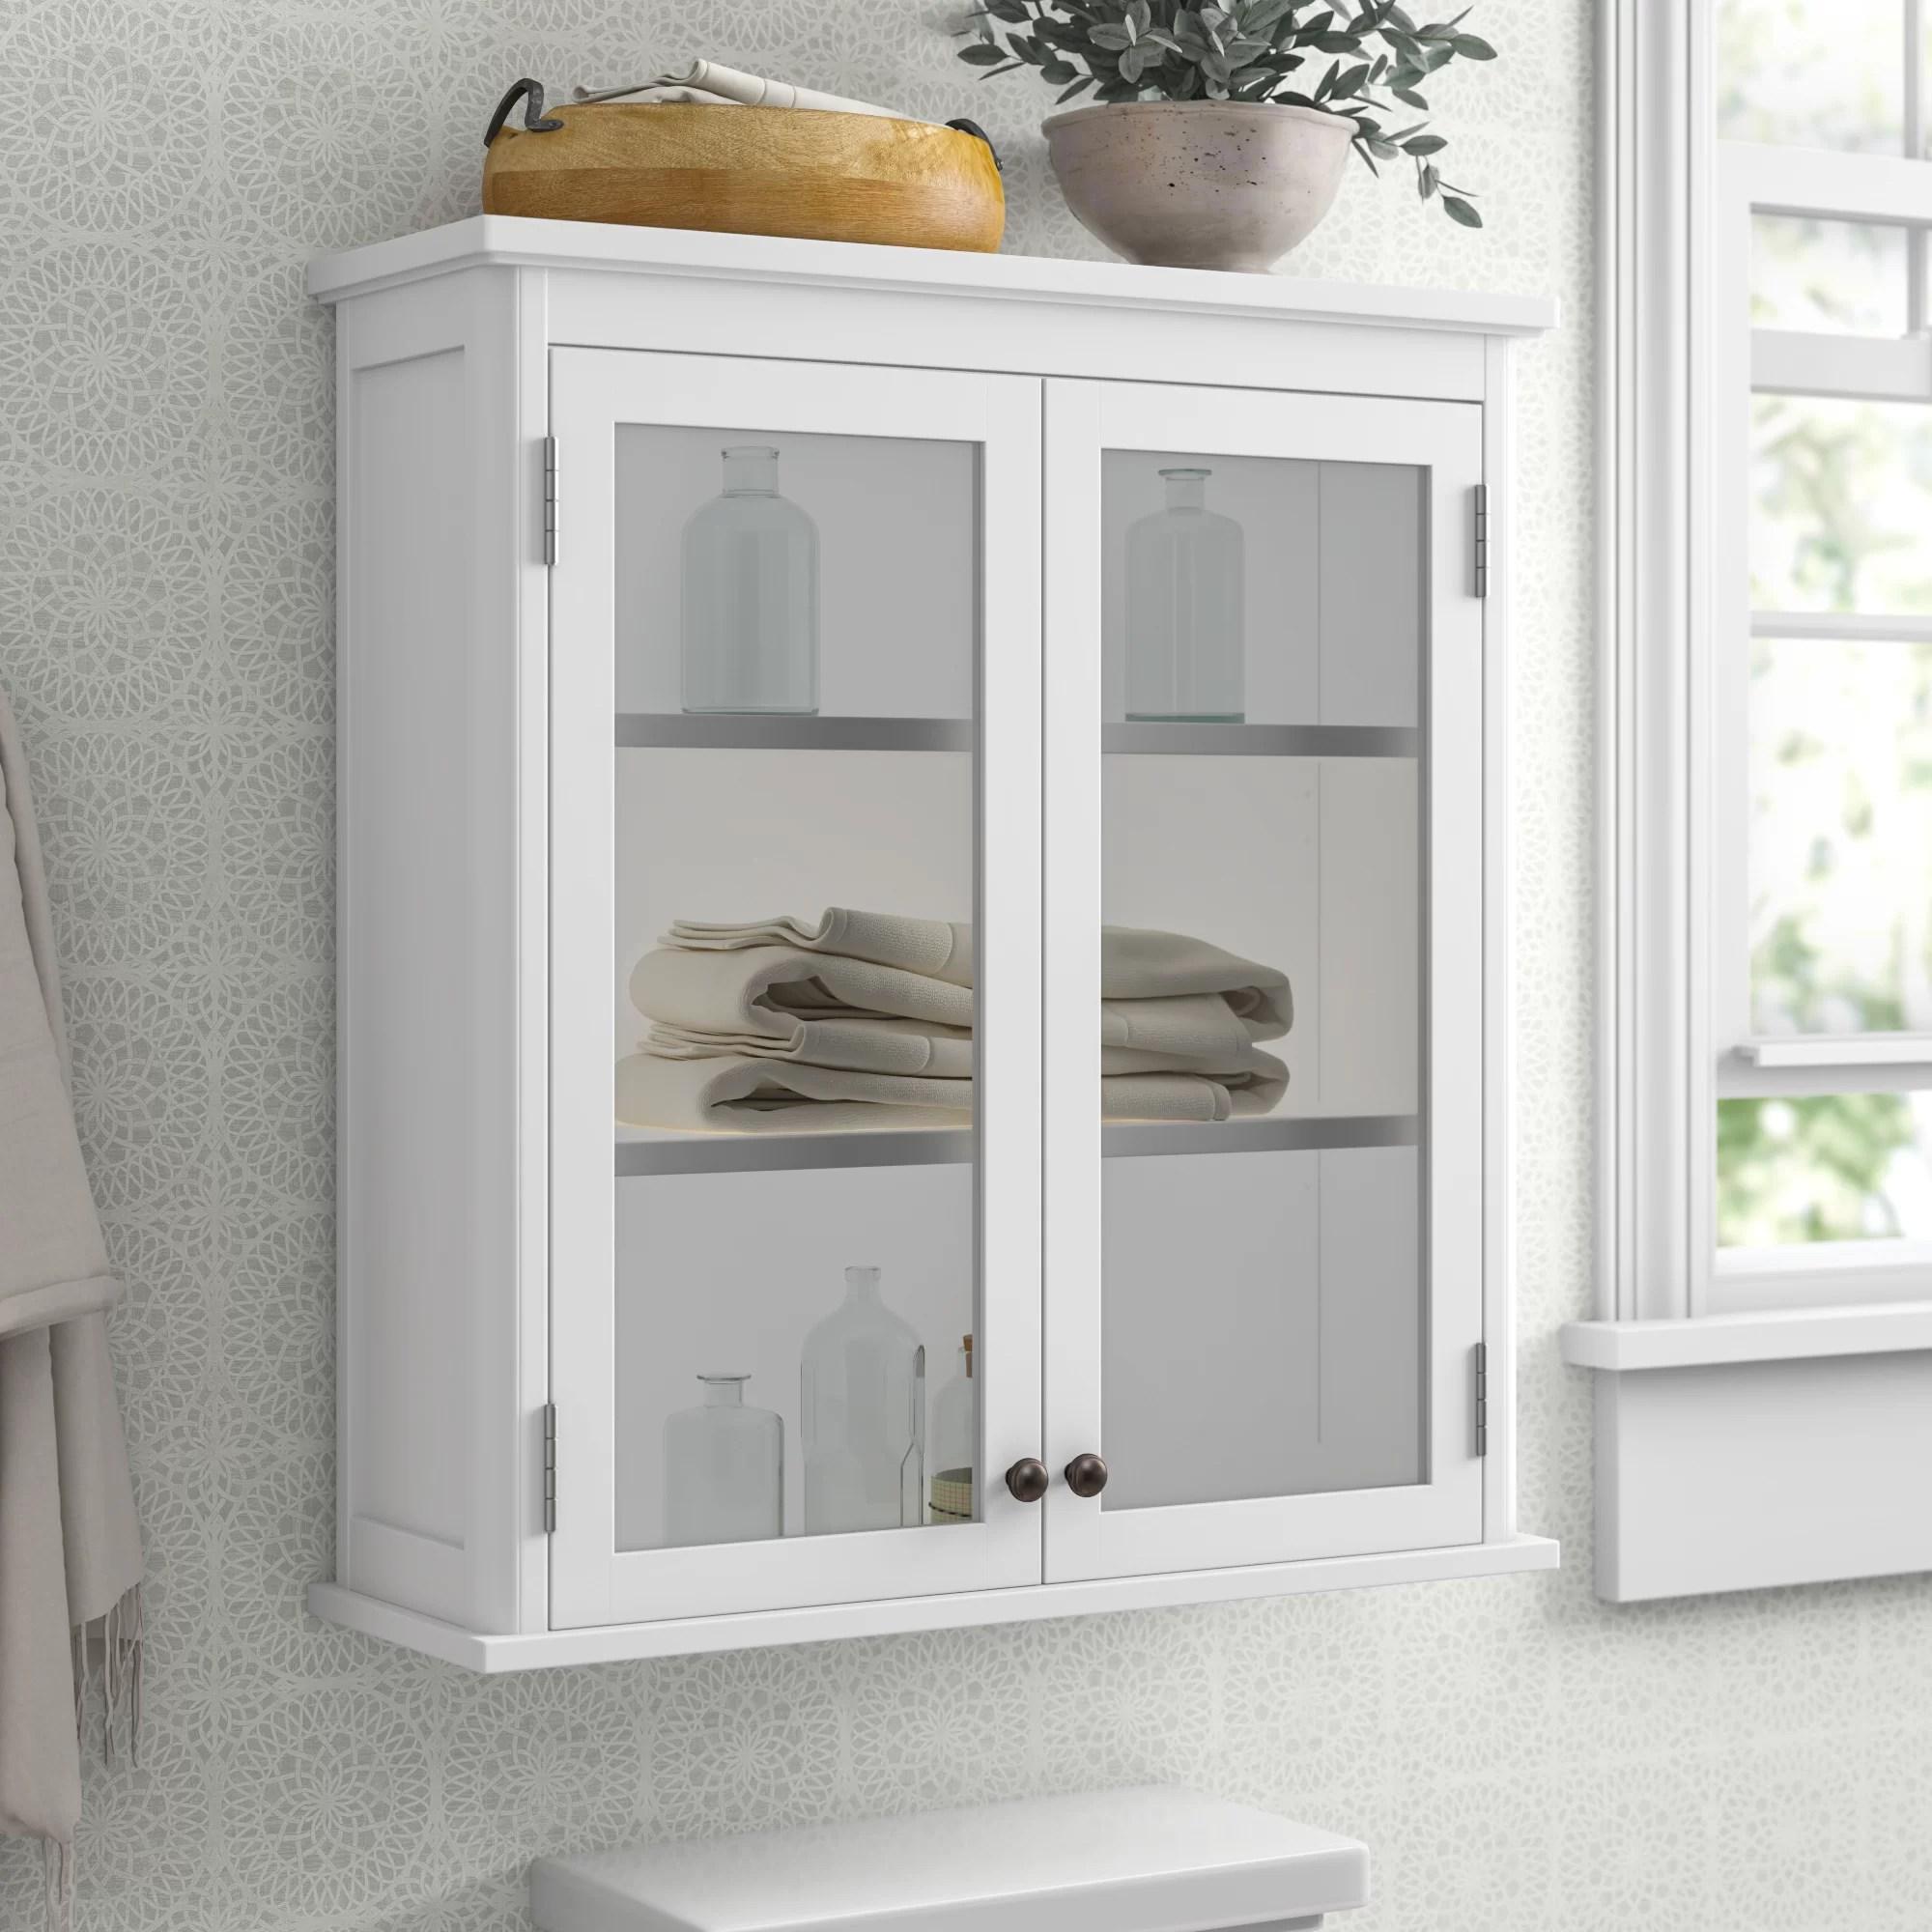 Amett 27 W X 29 H Wall Mounted Bath Storage Cabinet Reviews